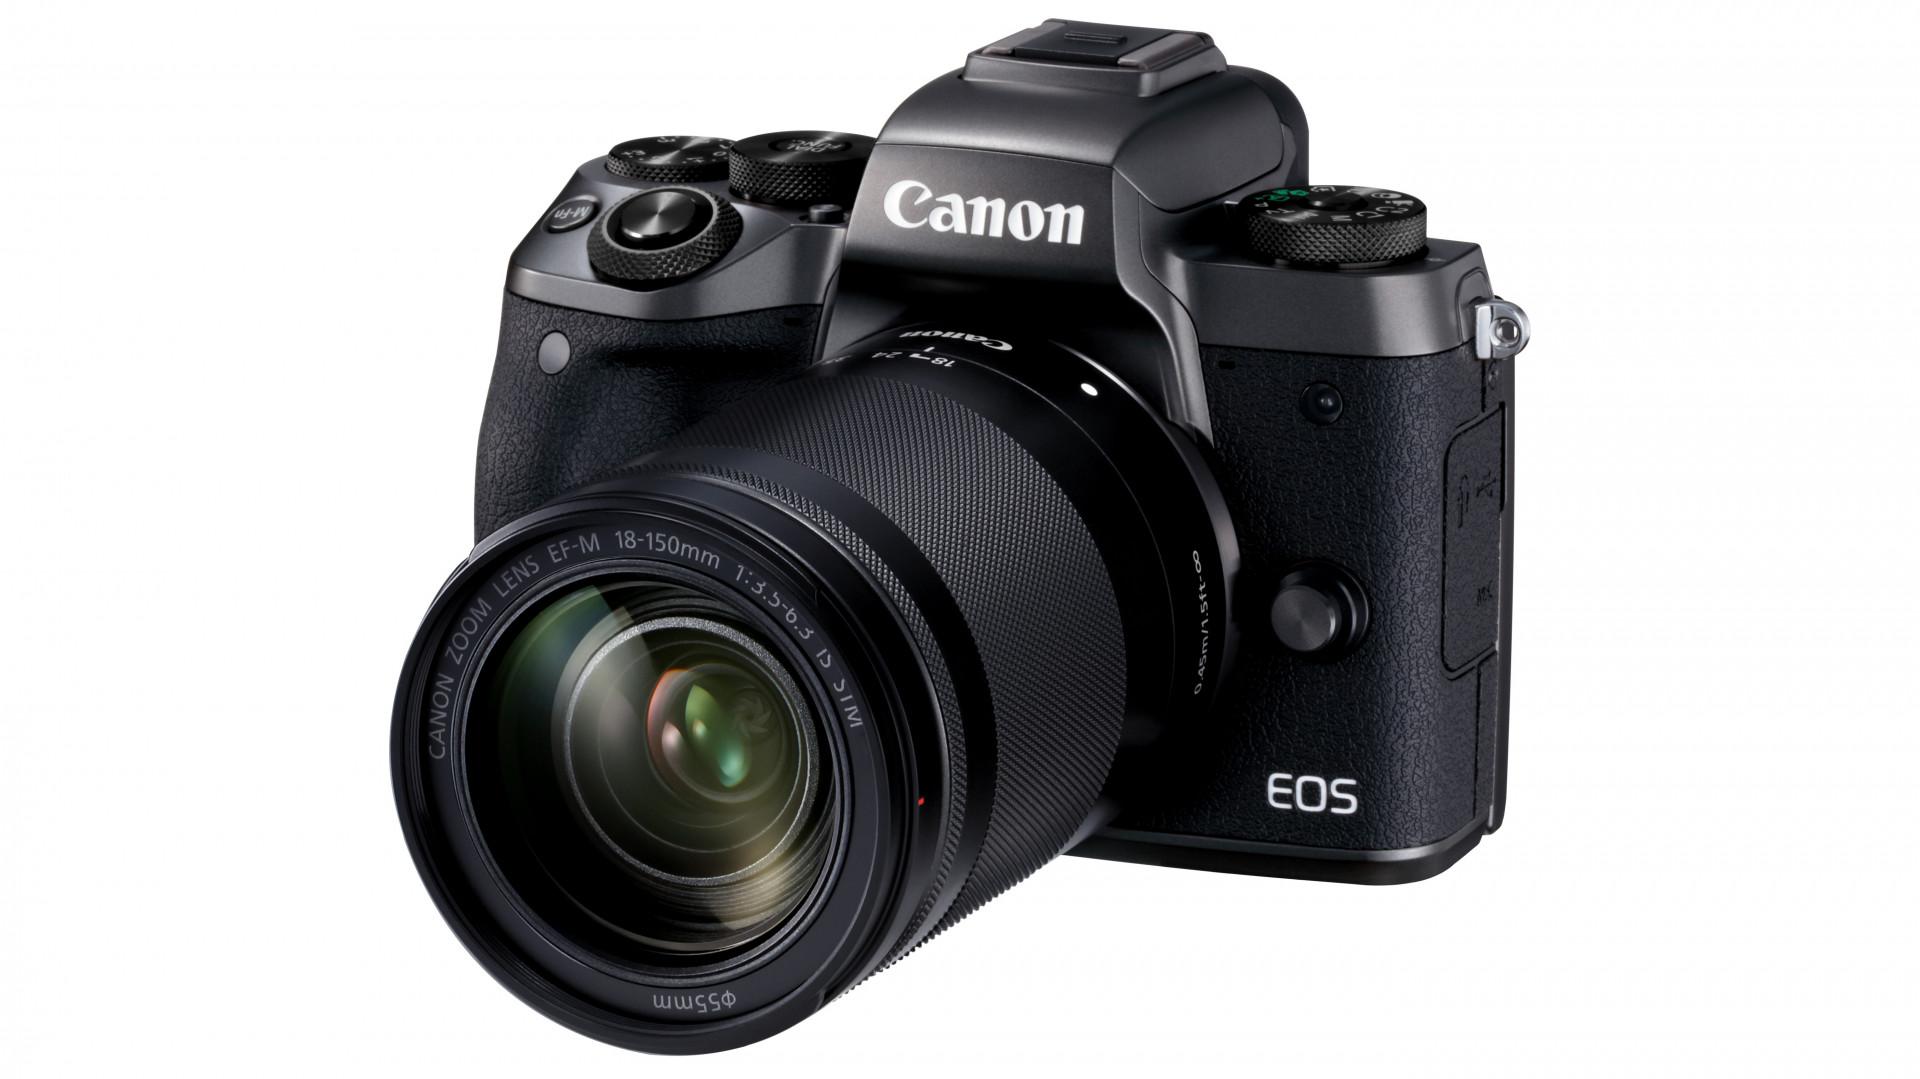 canon eos m5 spiegellose systemkamera f r ambitionierte. Black Bedroom Furniture Sets. Home Design Ideas